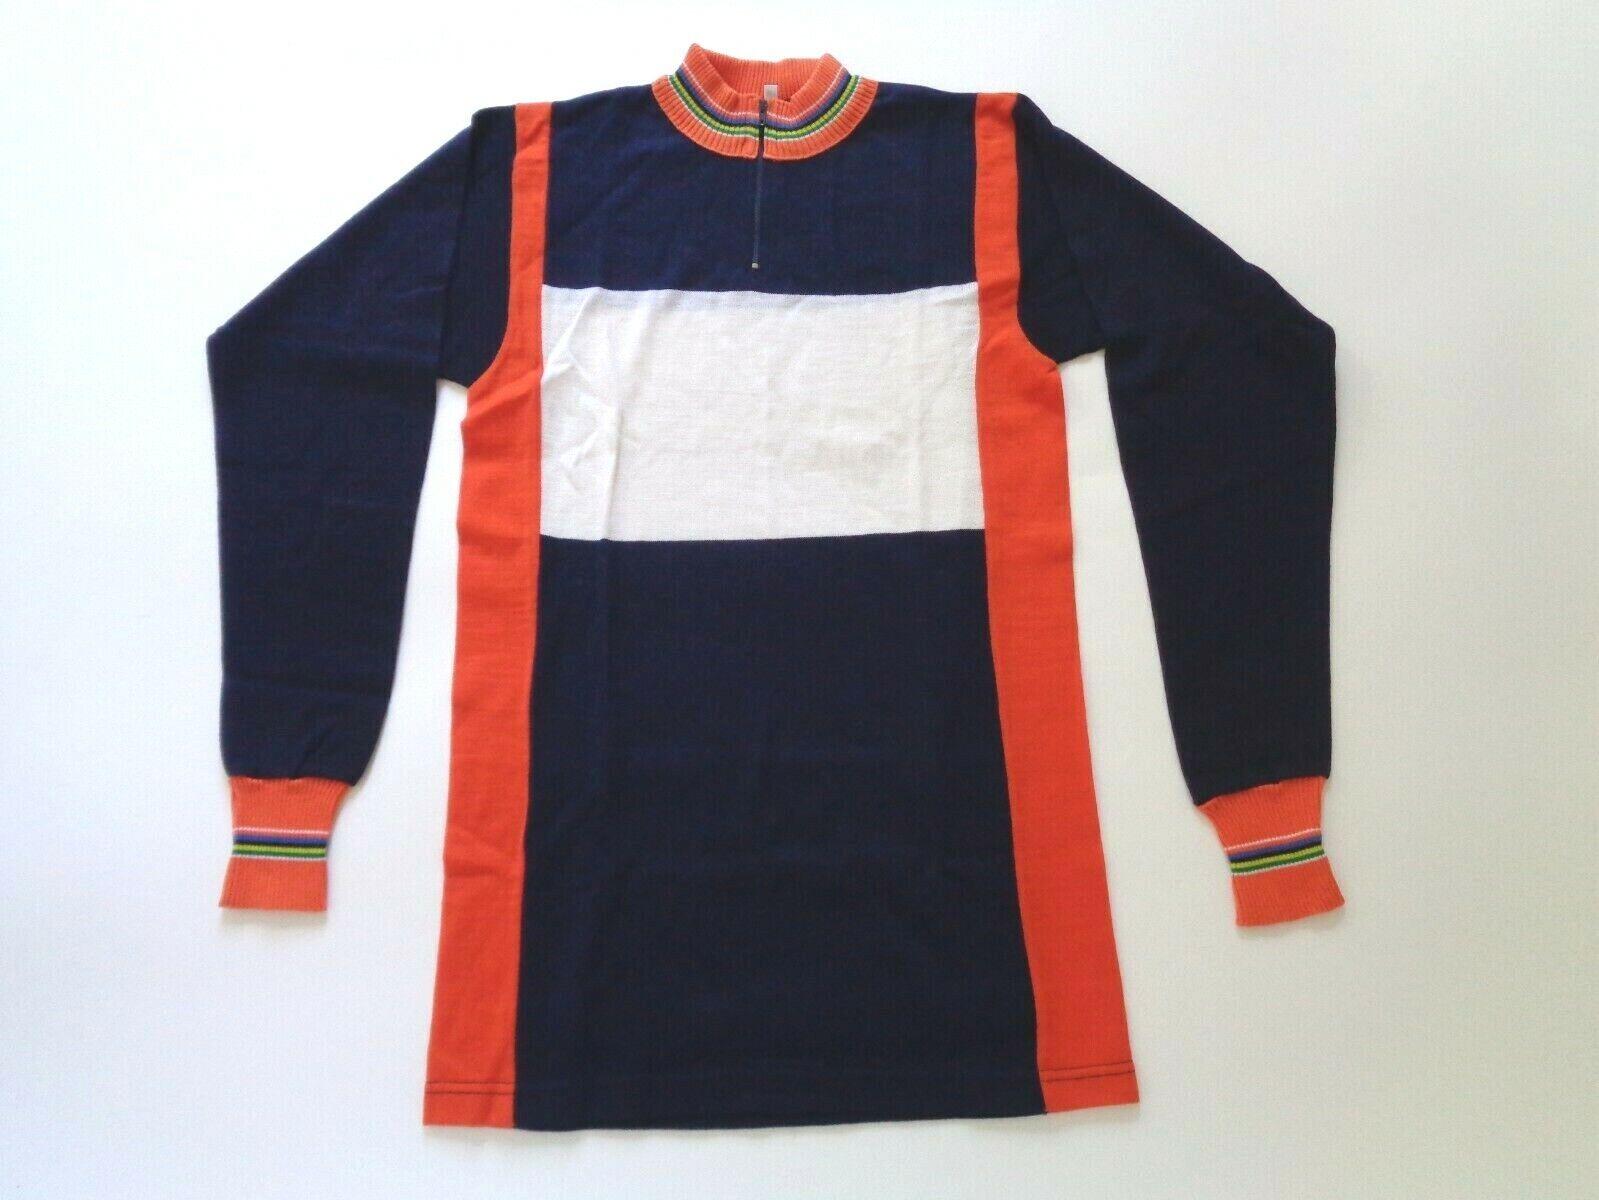 noas retro. Camiseta del ciclo de lana italiana de 1970 (azul   naranja   blancoo) Código s